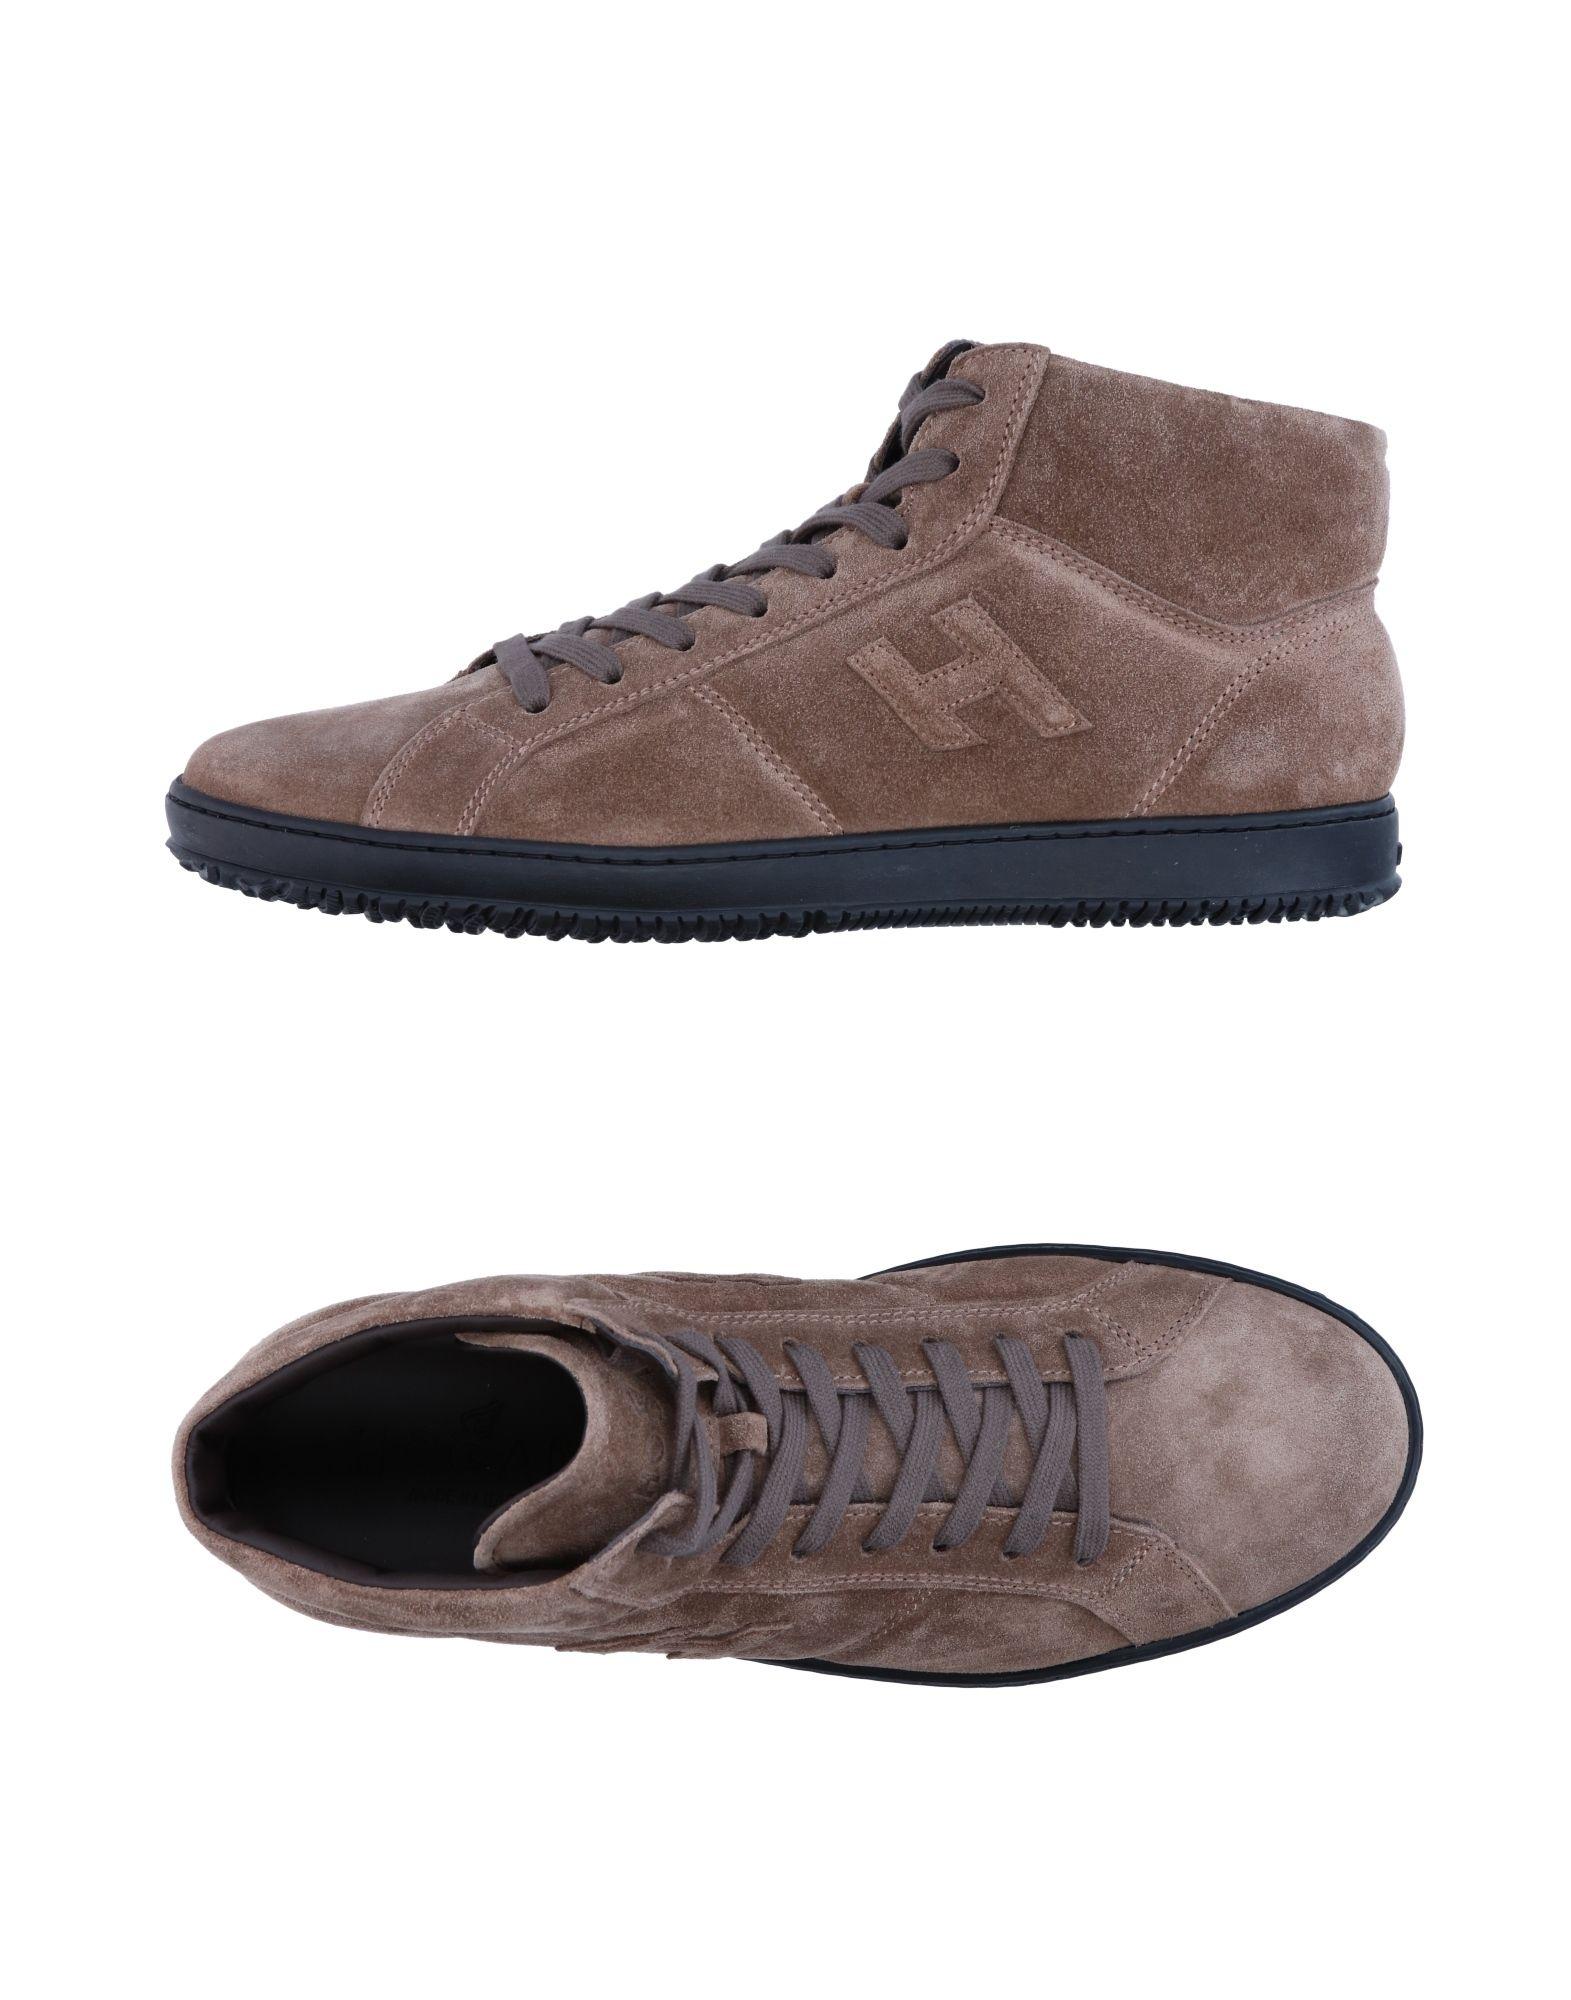 Hogan Sneakers Herren  11288447JX Gute Qualität beliebte Schuhe